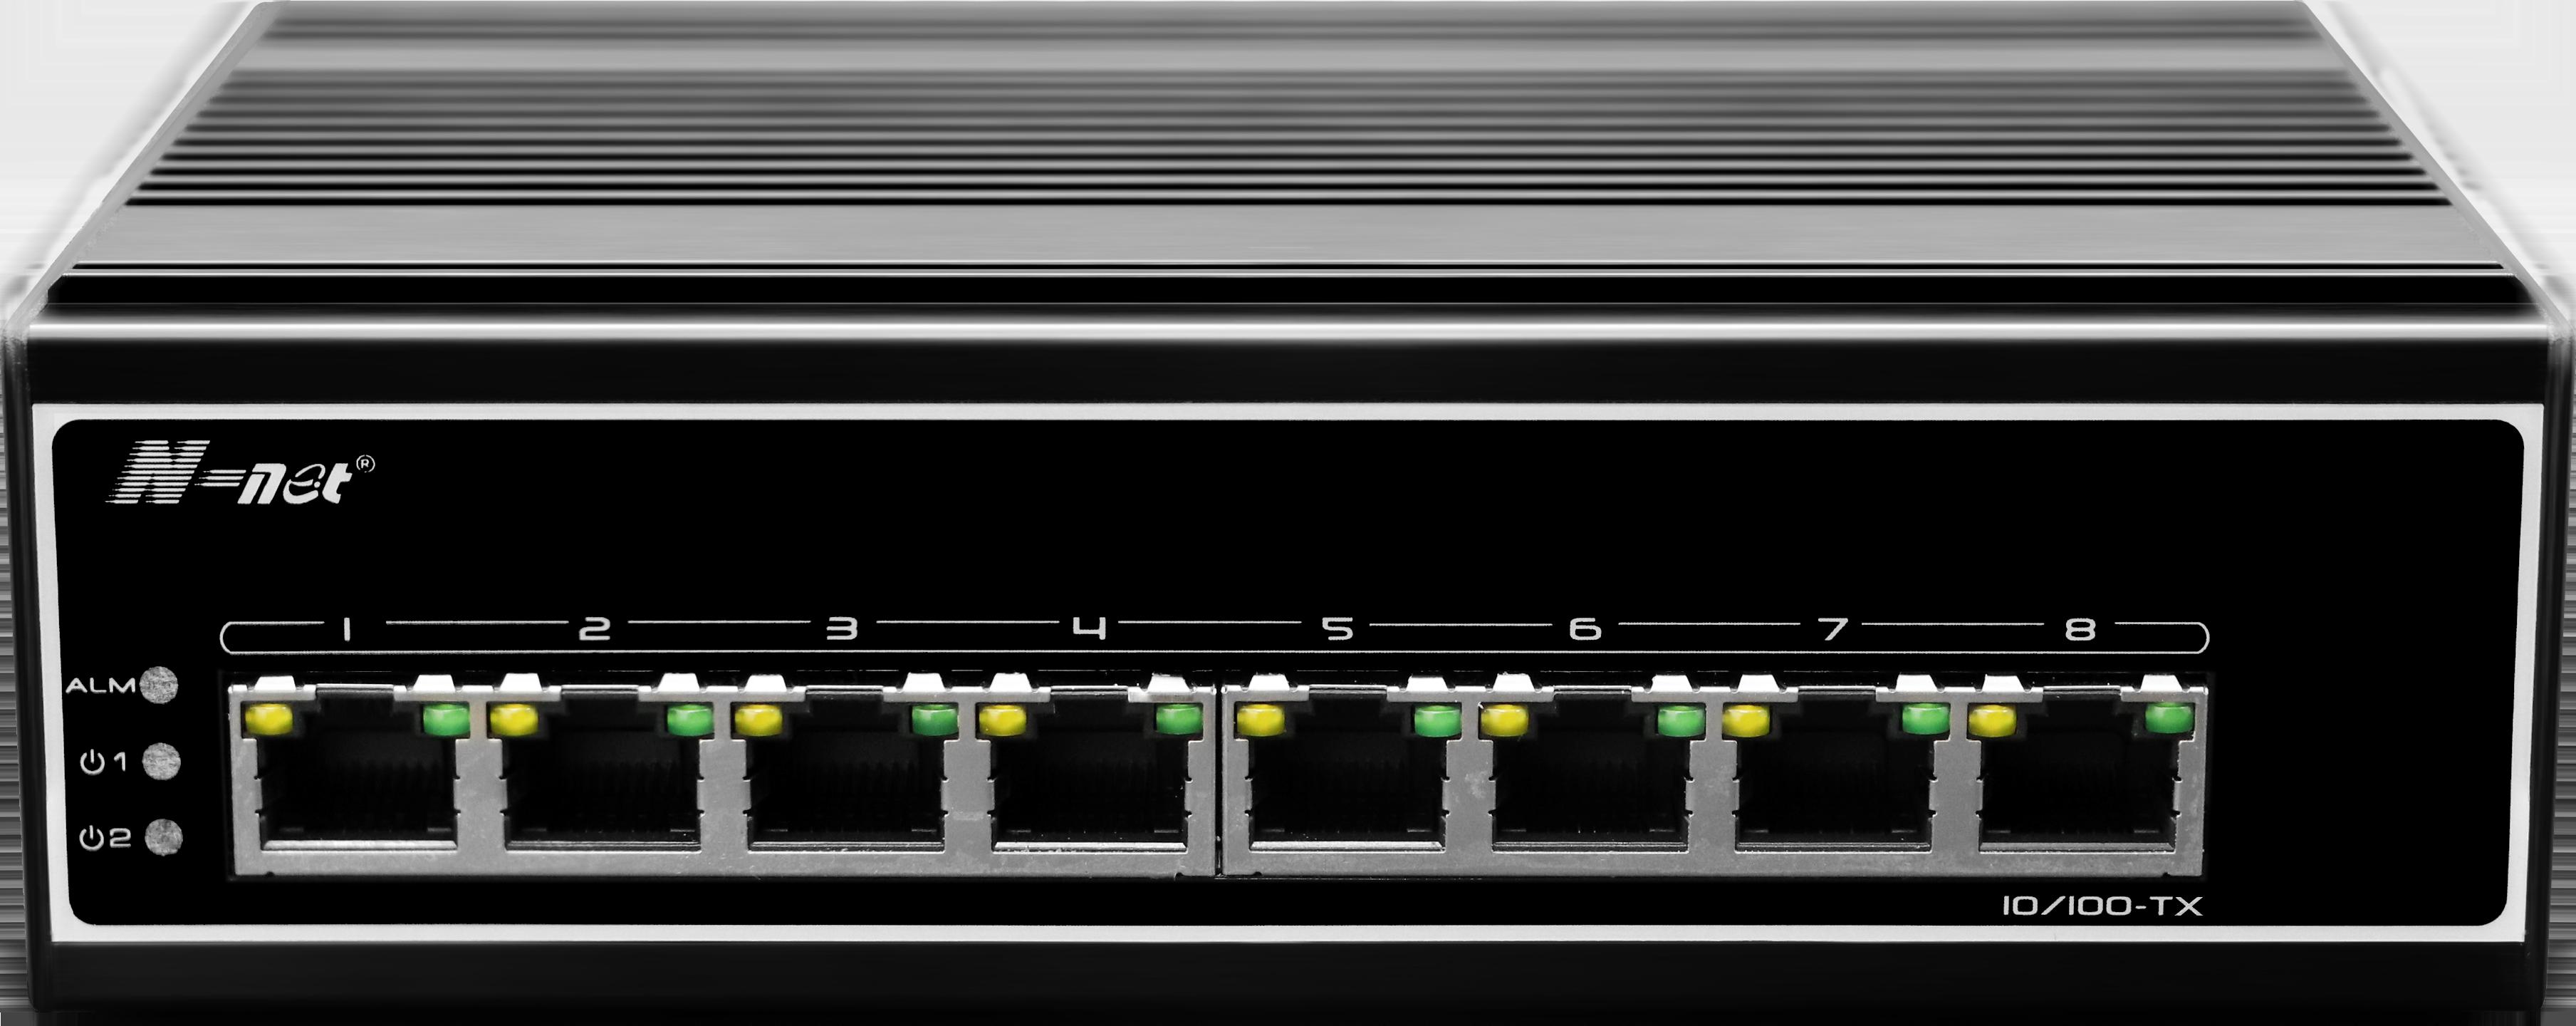 NIE608E 8口百兆工业级交换机